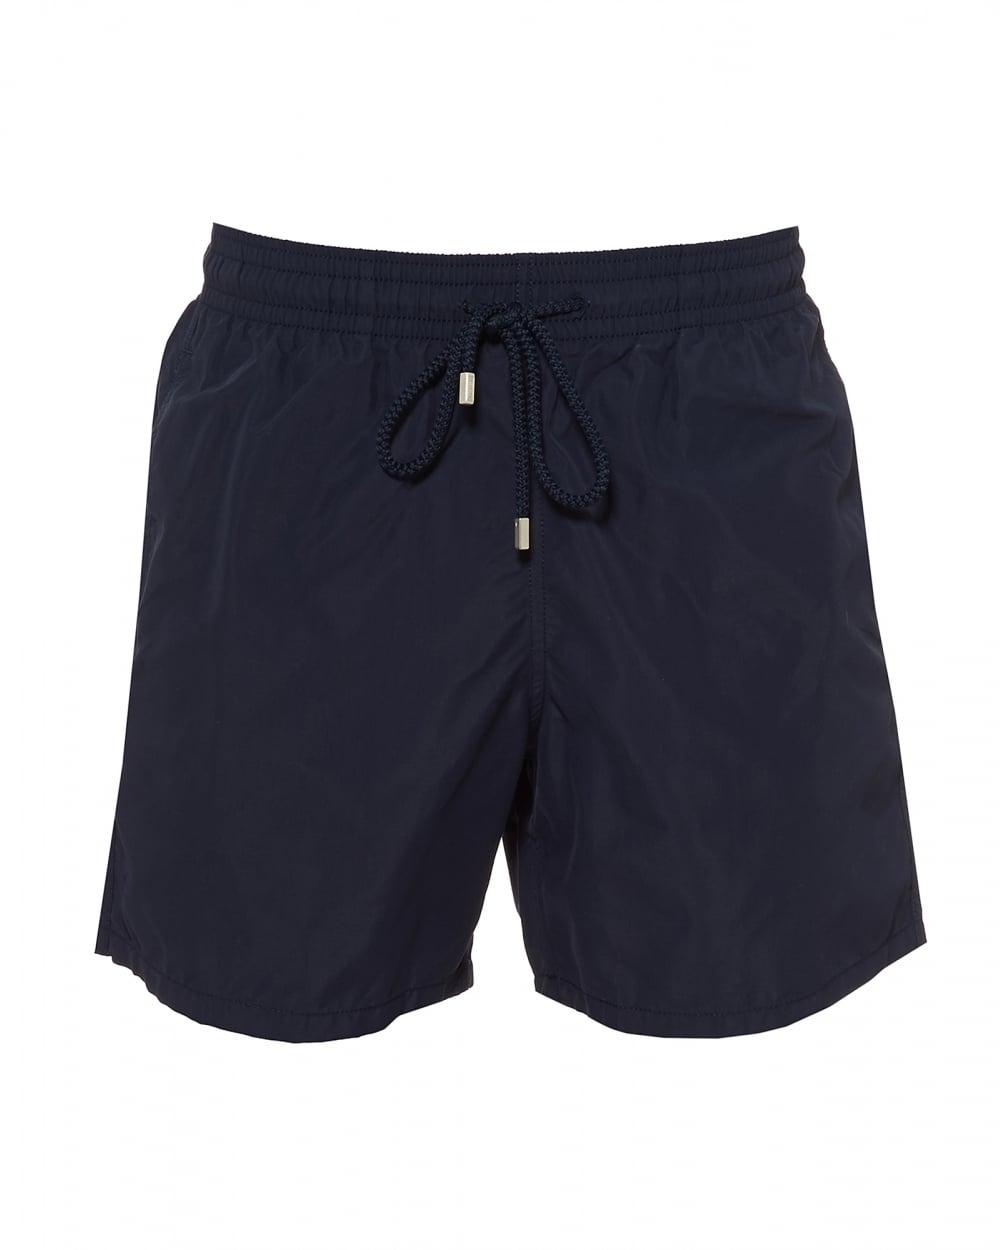 9b871205ec Vilebrequin Mens Moorea Plain Swimshorts, Navy Blue Swimming ...